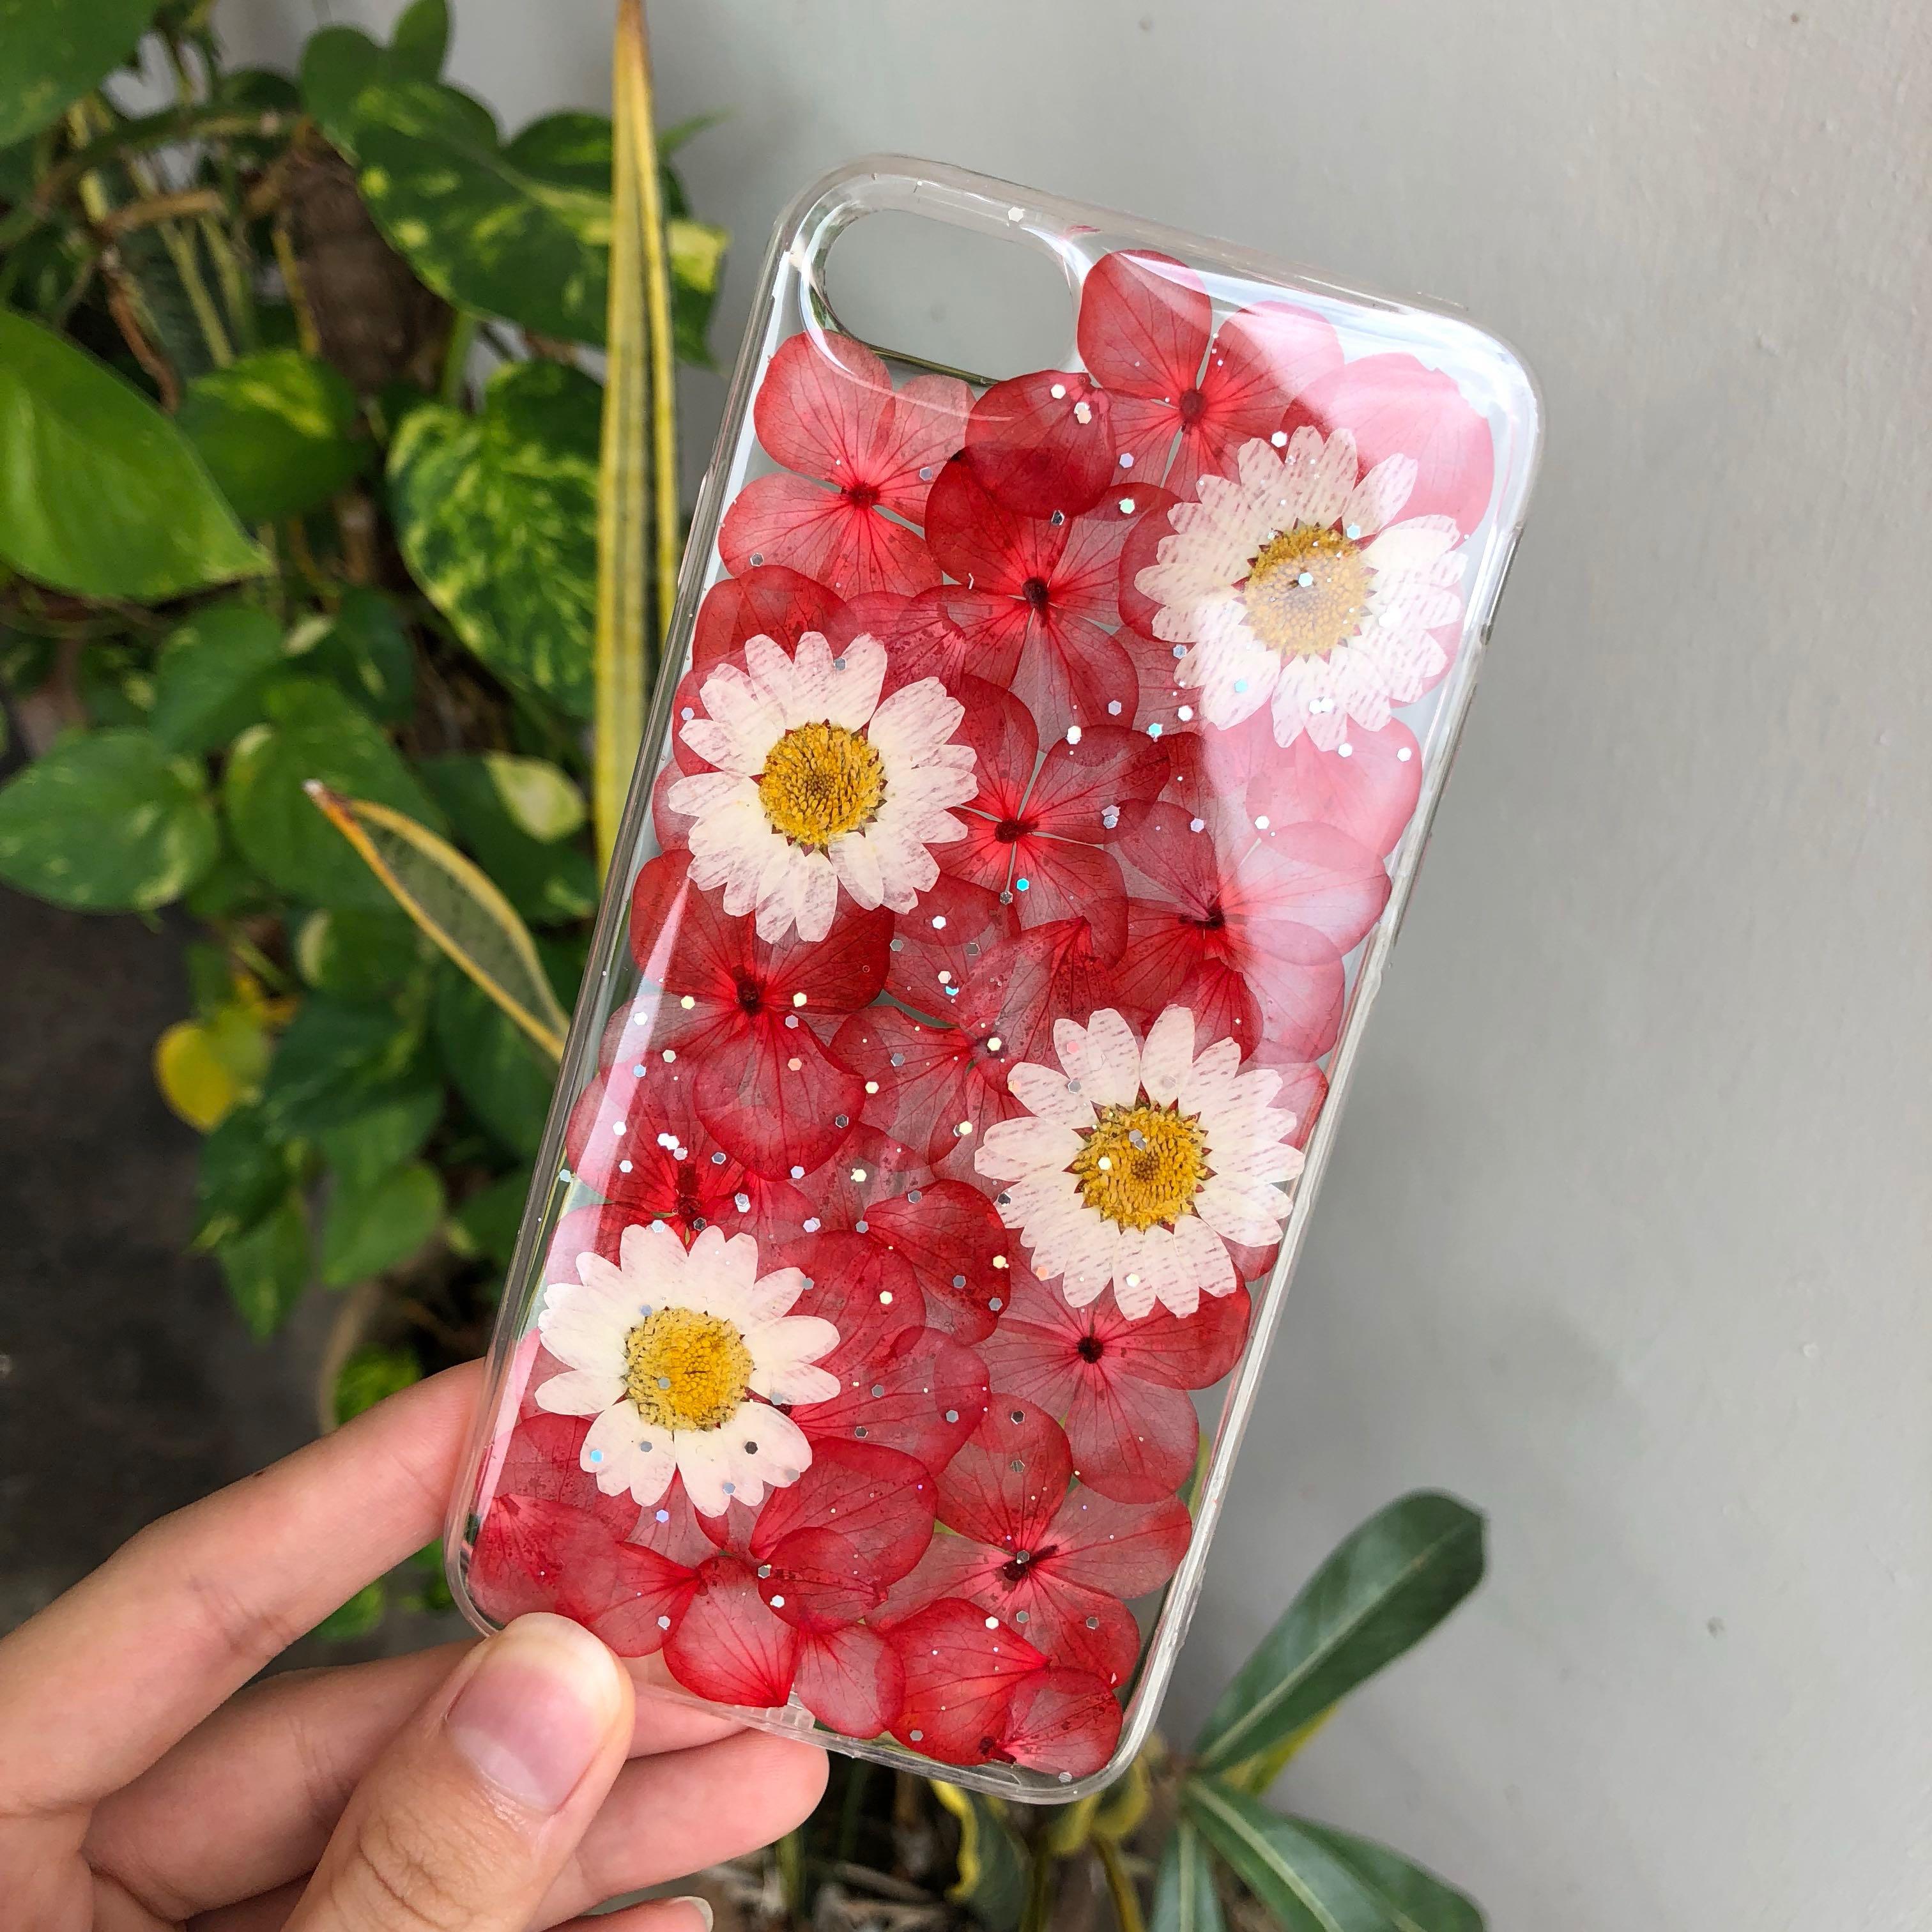 fb715c3649a576 Handmade Dry Flower Phone Case❤️New Arrival🌺, Mobile Phones ...